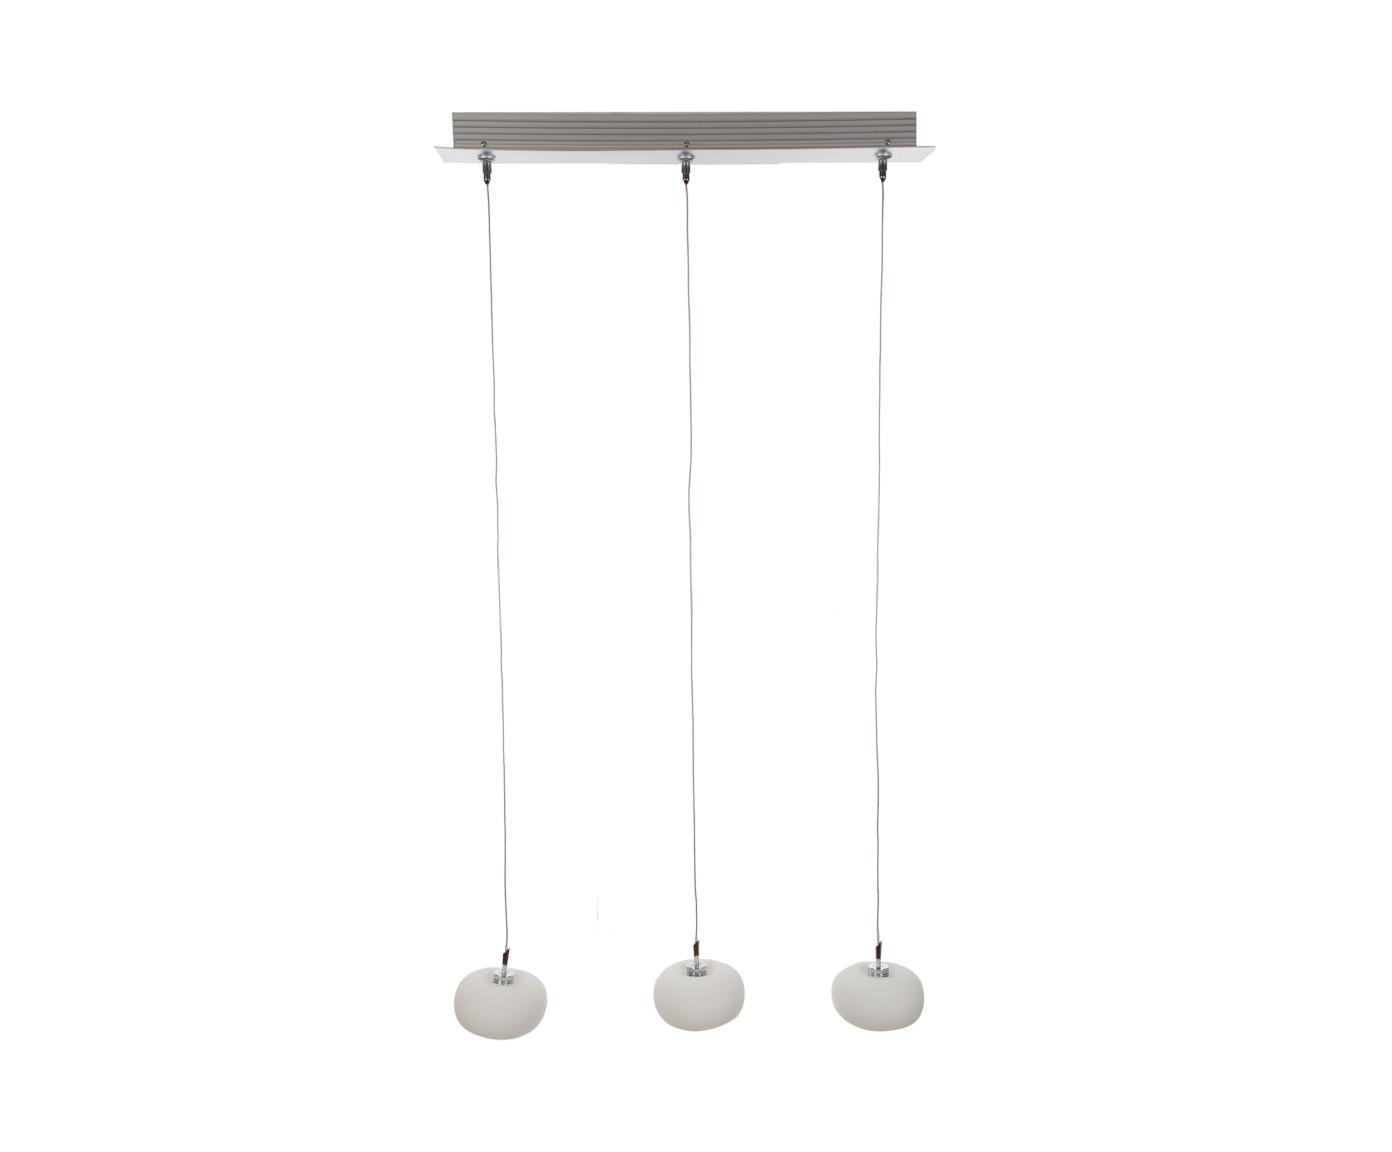 цена {} CRYSTAL LIGHT Светильник потолочный Lilyum Цвет: Белый (10х63х180 см) онлайн в 2017 году